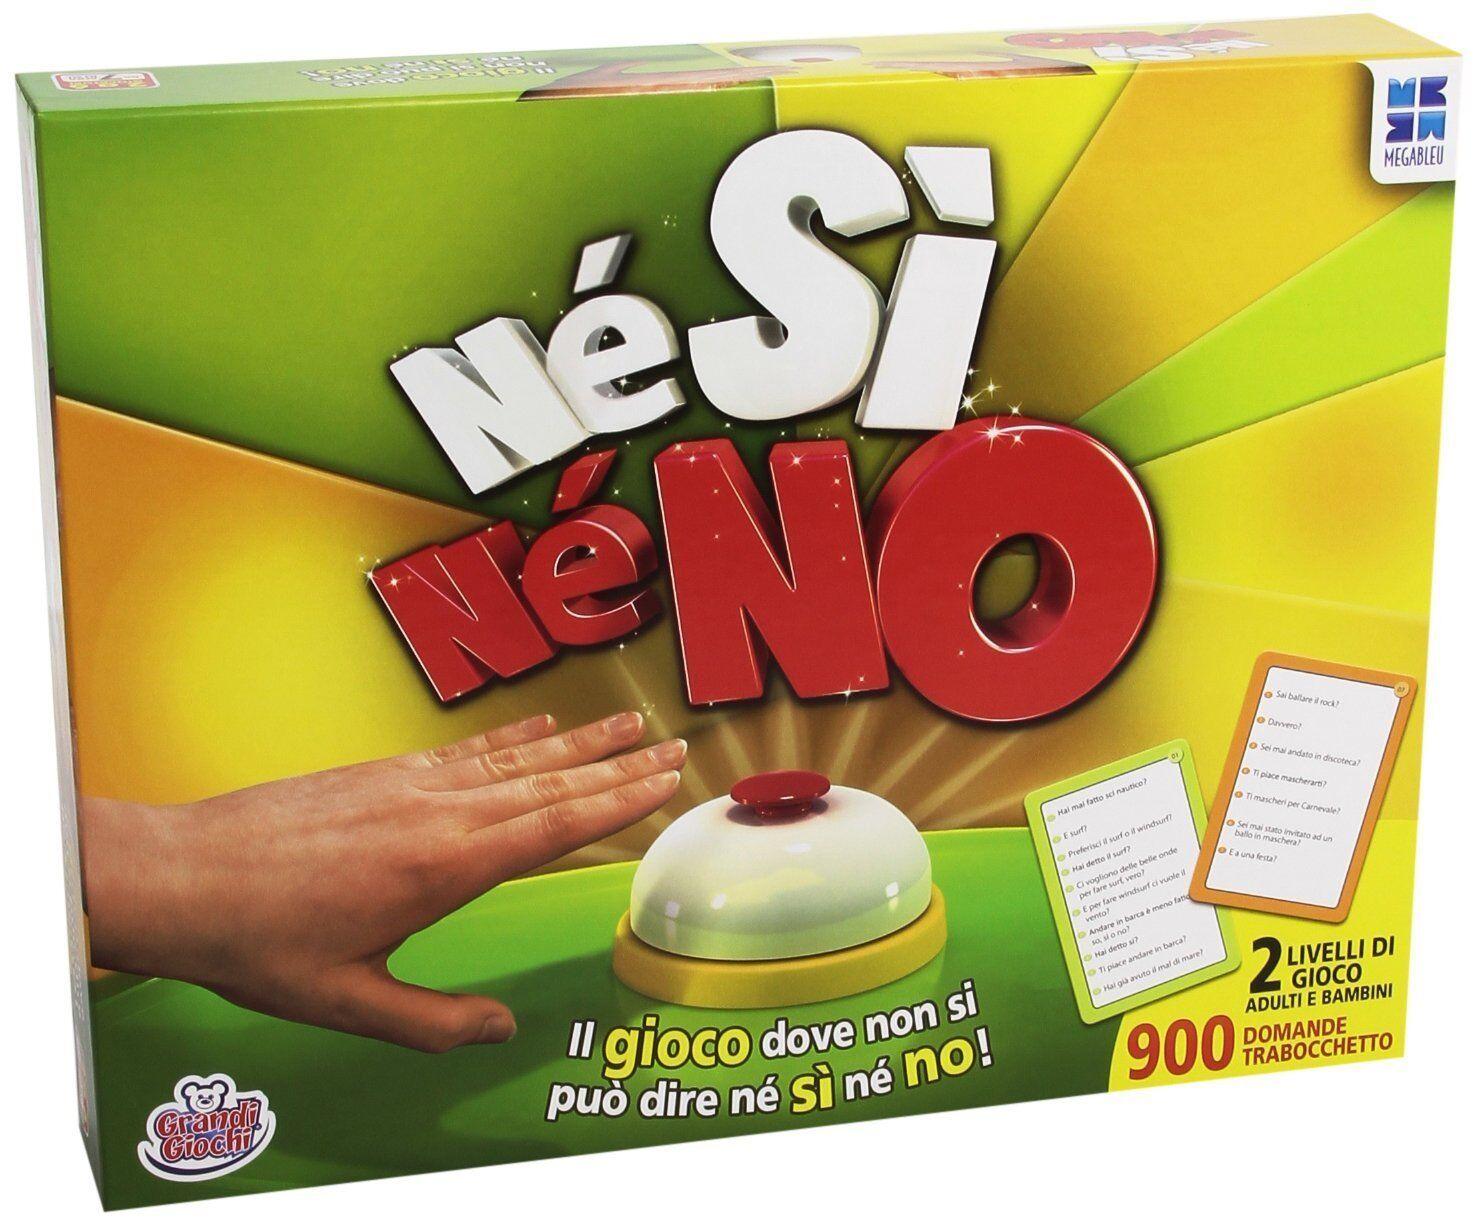 Né sì Né no